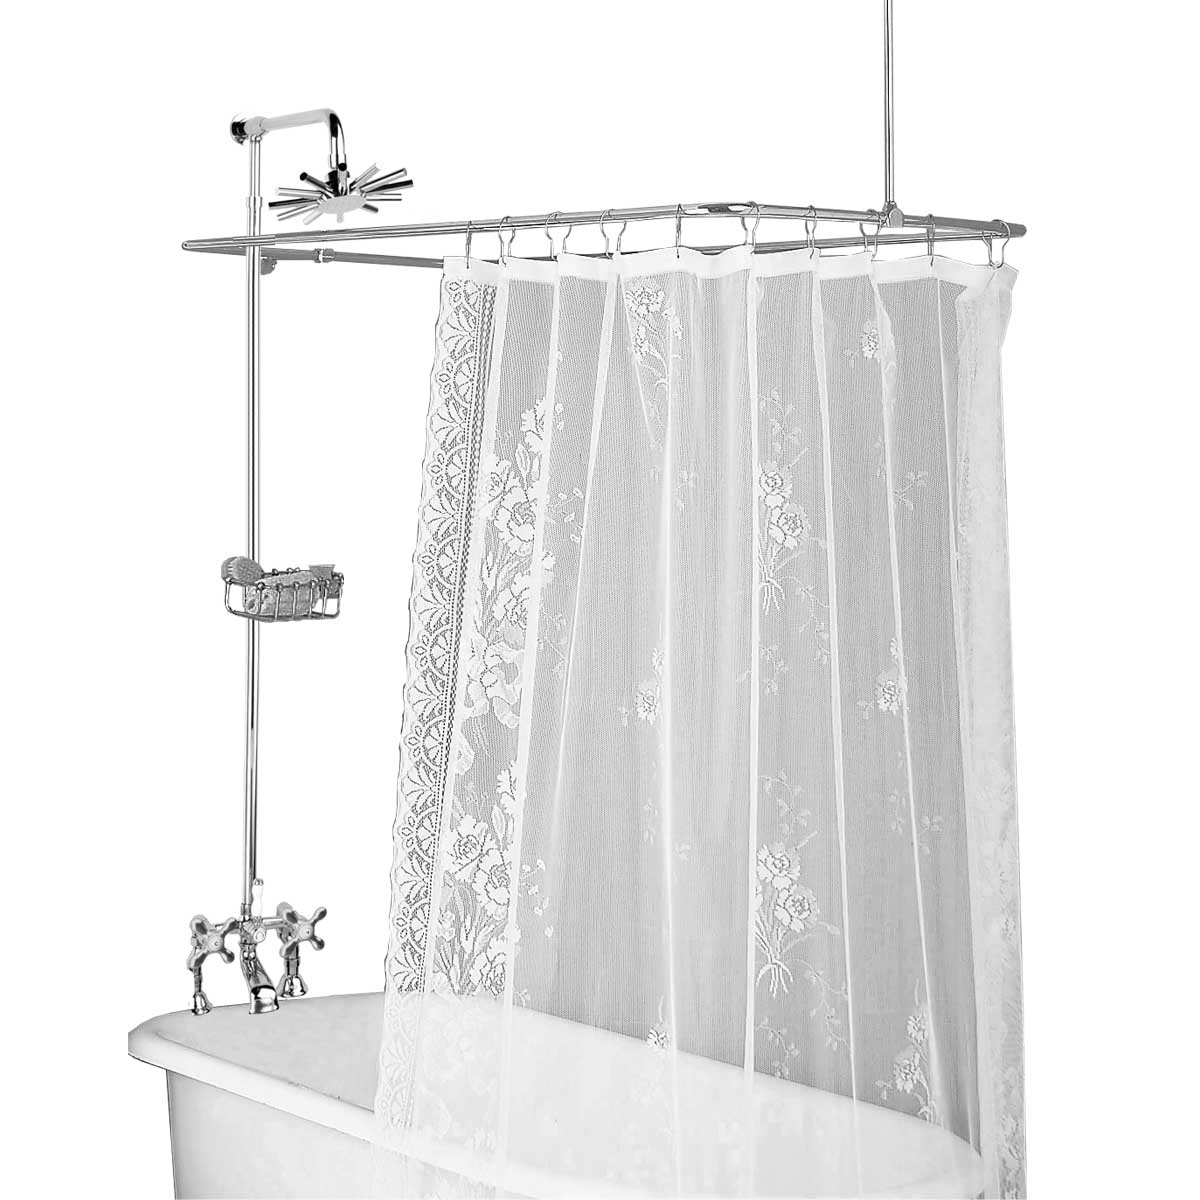 Clawfoot Tub Deck Mount Shower Set Rectangular Enclosure Renovator S Supply